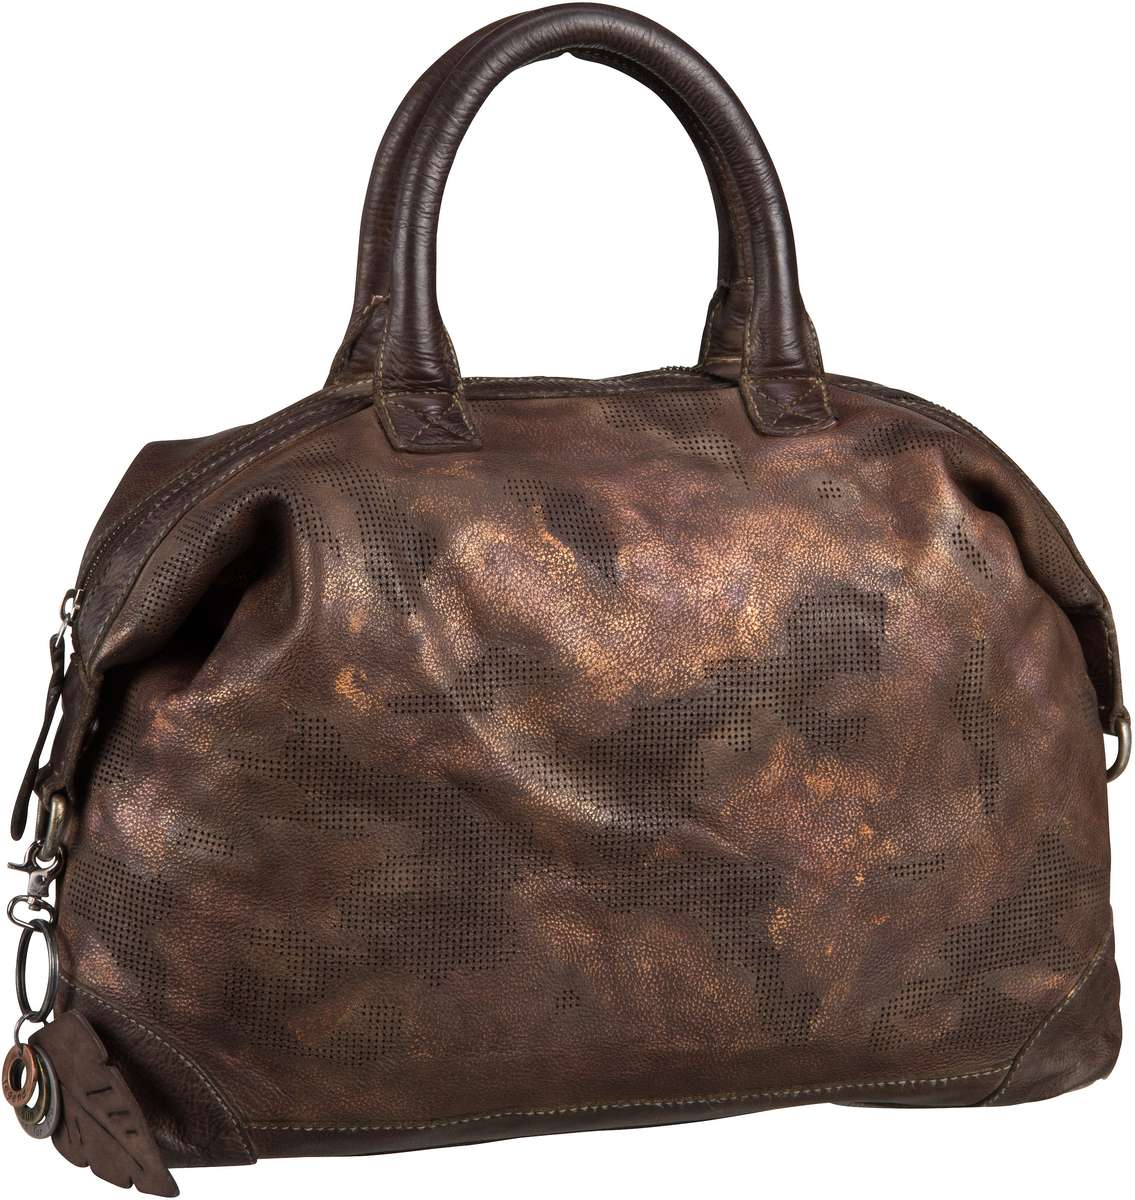 Legend Cagli Olive - Handtasche